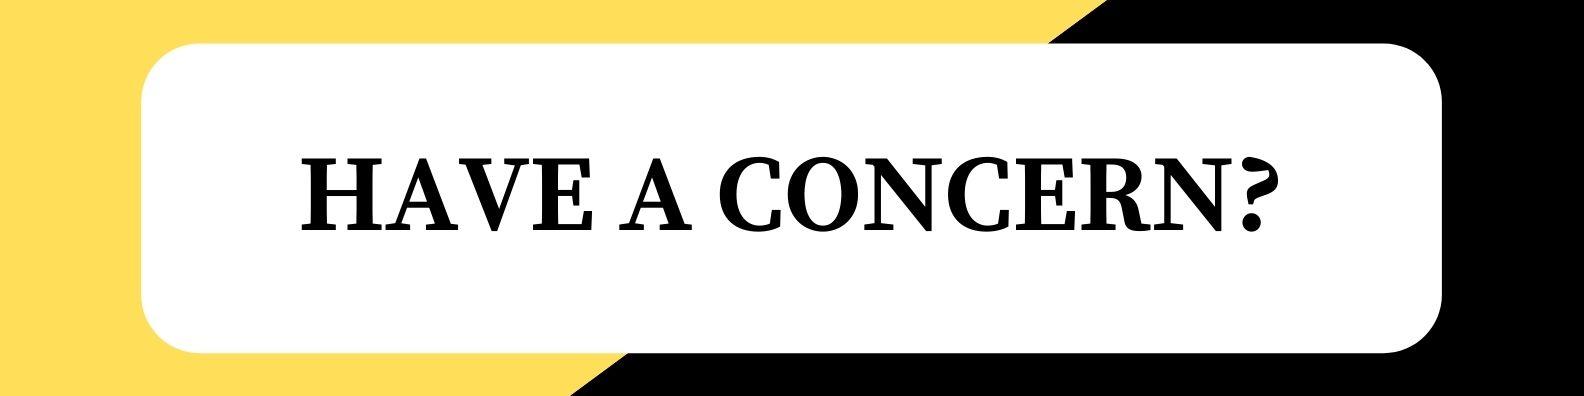 Have A Concern?